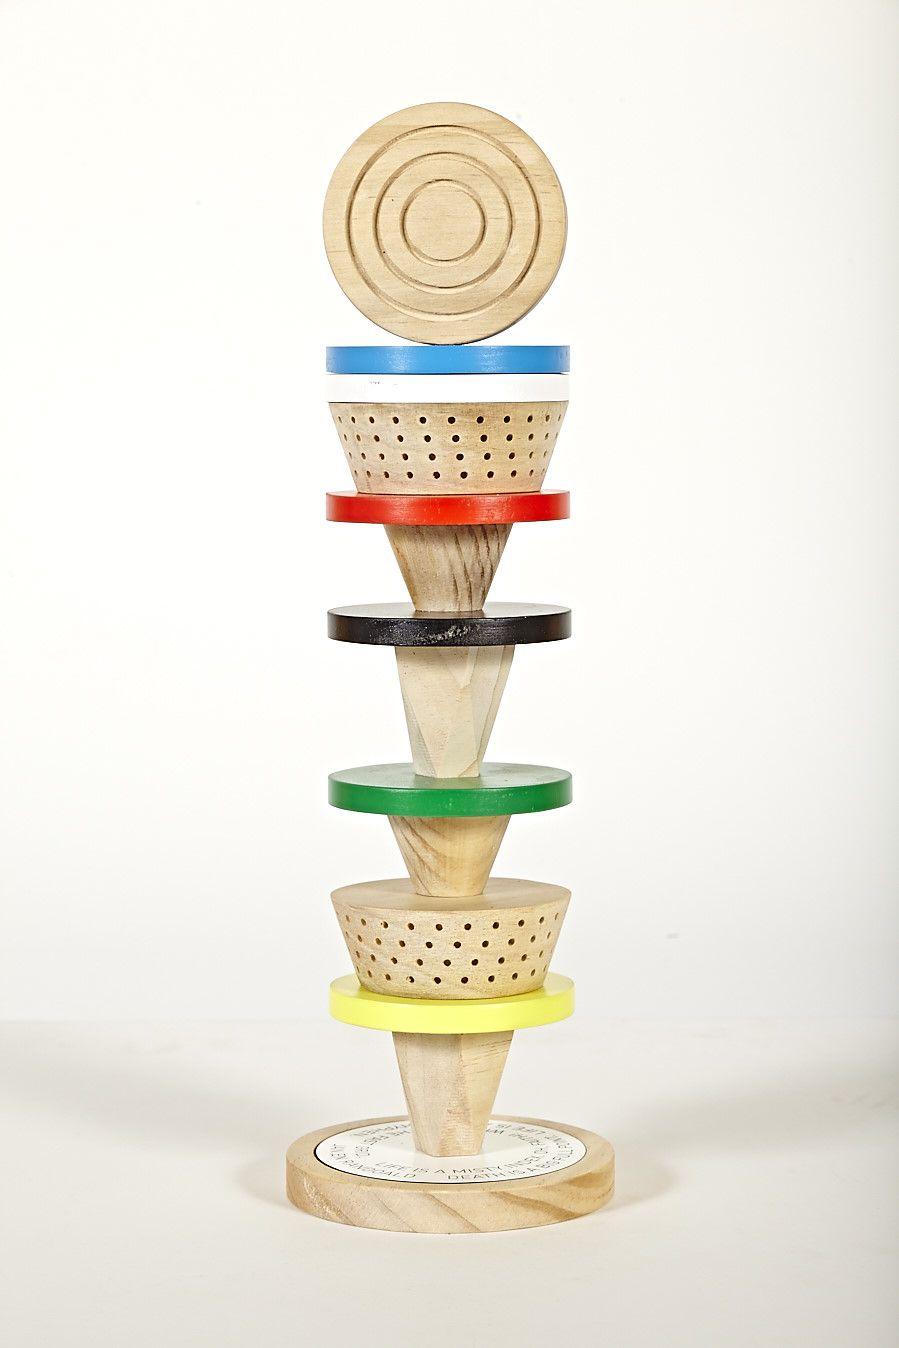 Jan en randoald ceramic art sculpture contemporary